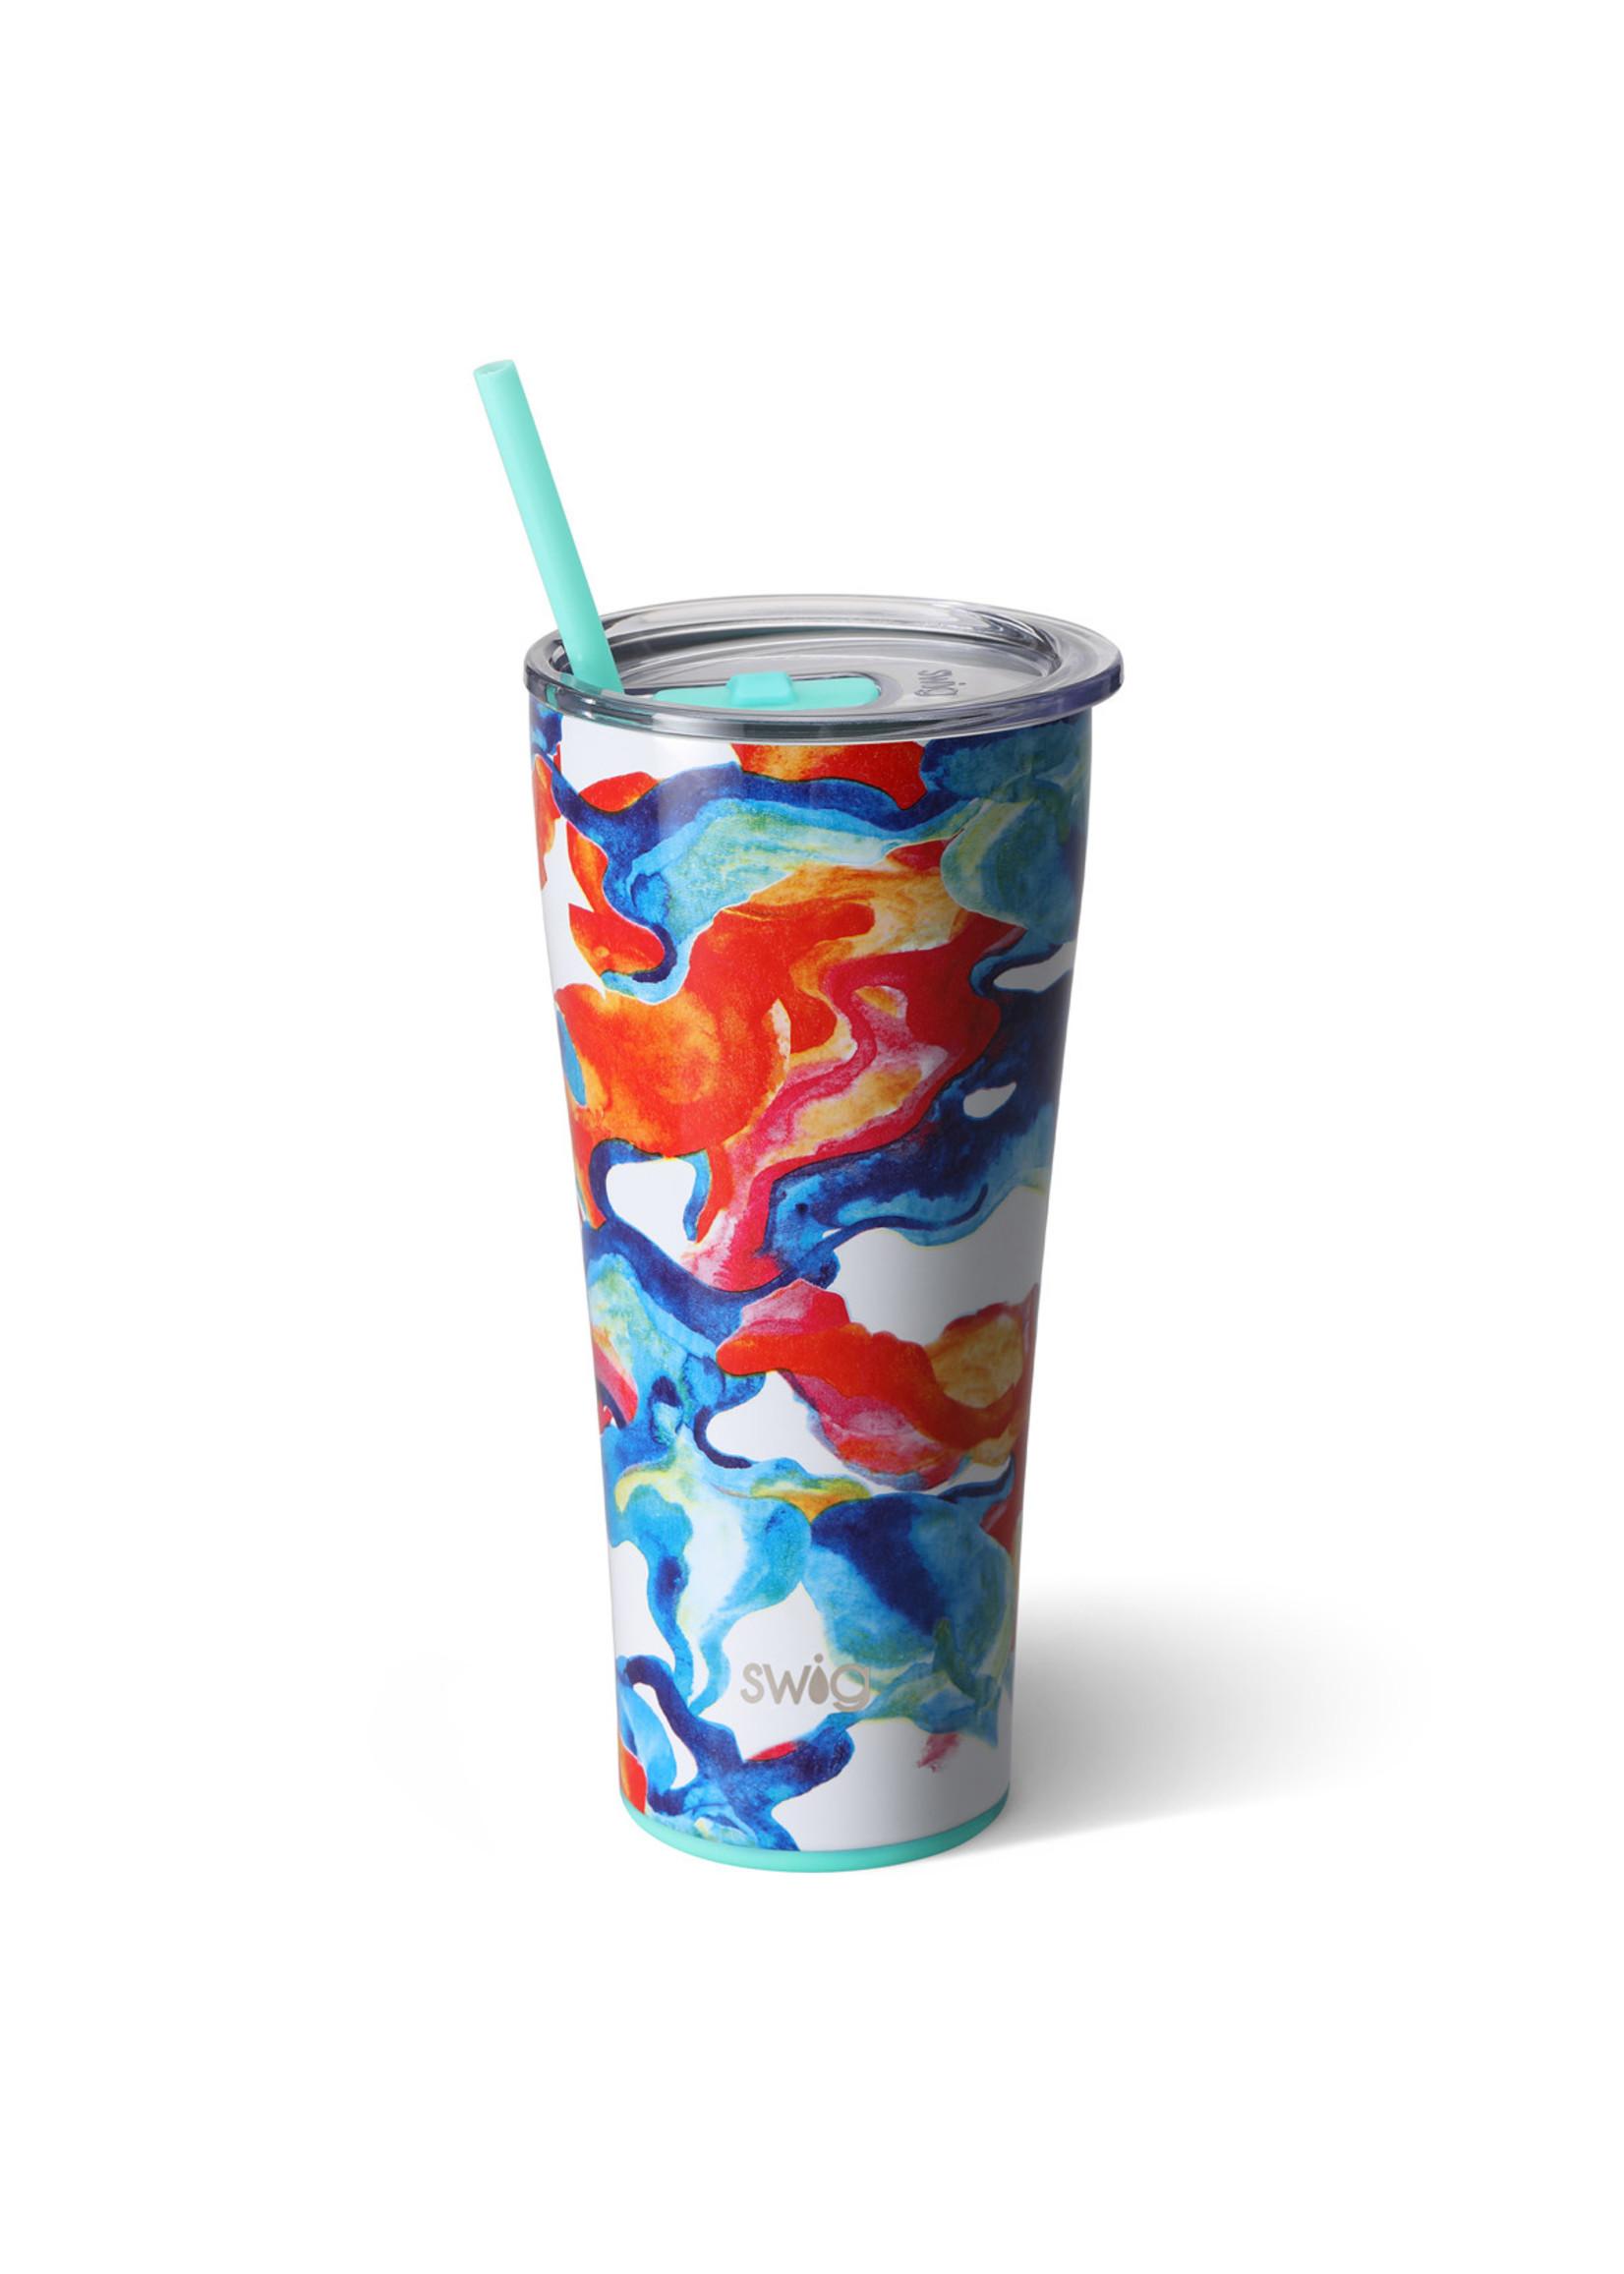 Swig Color Swirl 32oz Tumbler